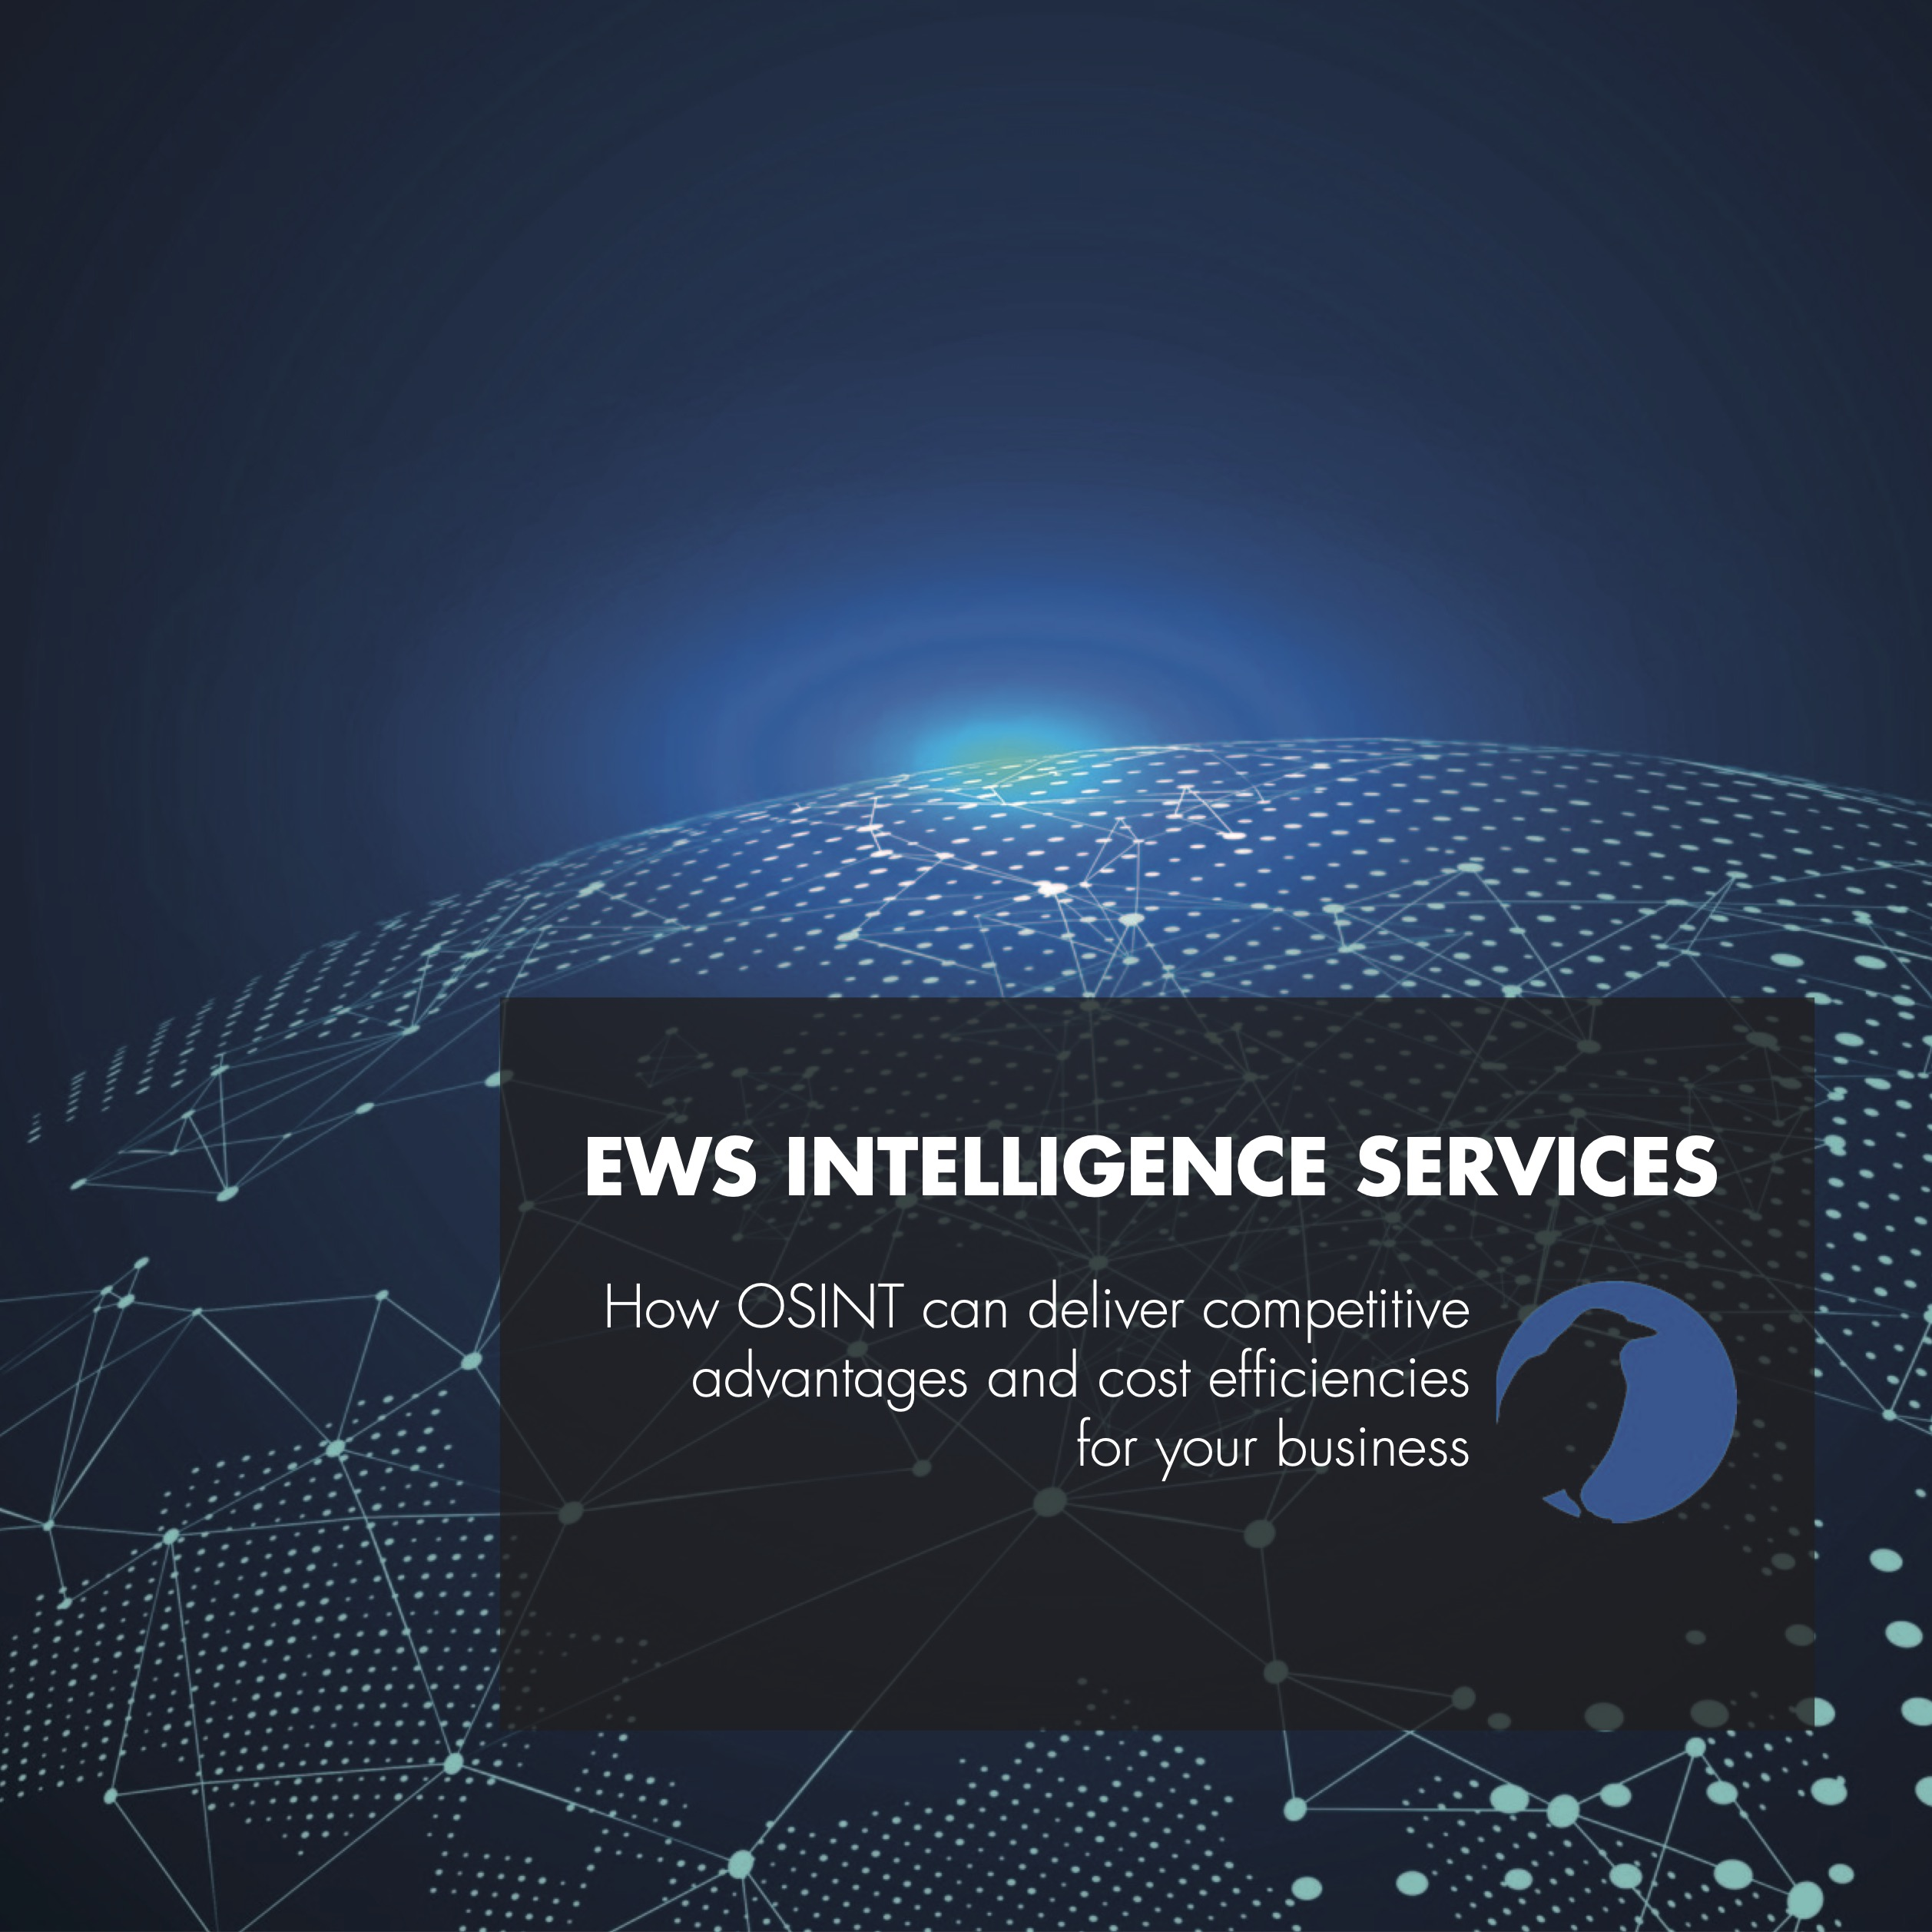 EWS Intelligence Services brochure